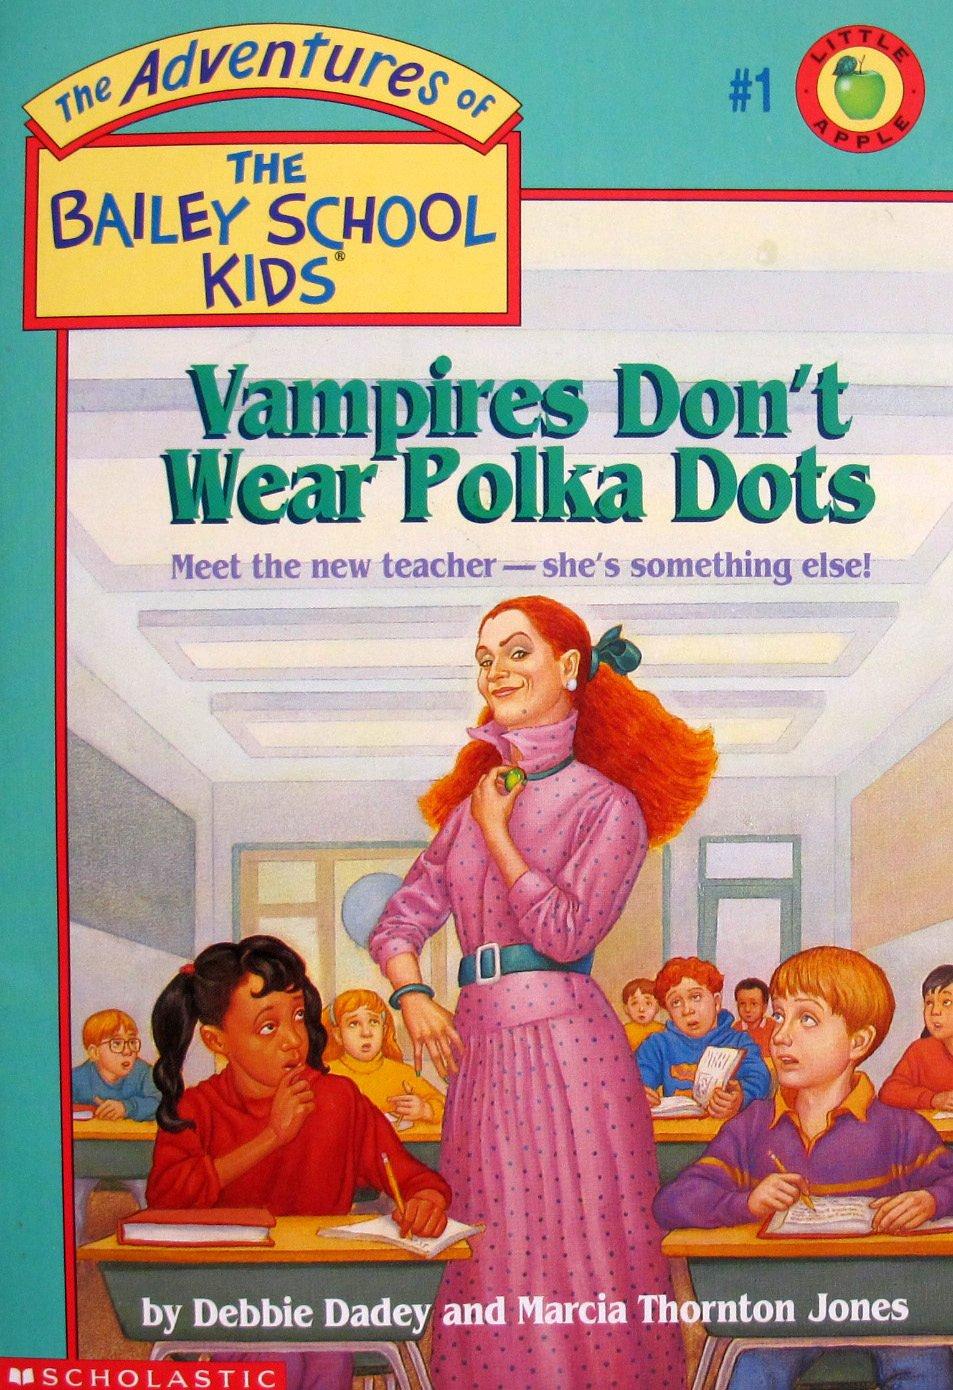 05e6de733f7b The Adventures Of The Bailey School Kids #1: Vampires Don't Wear ...